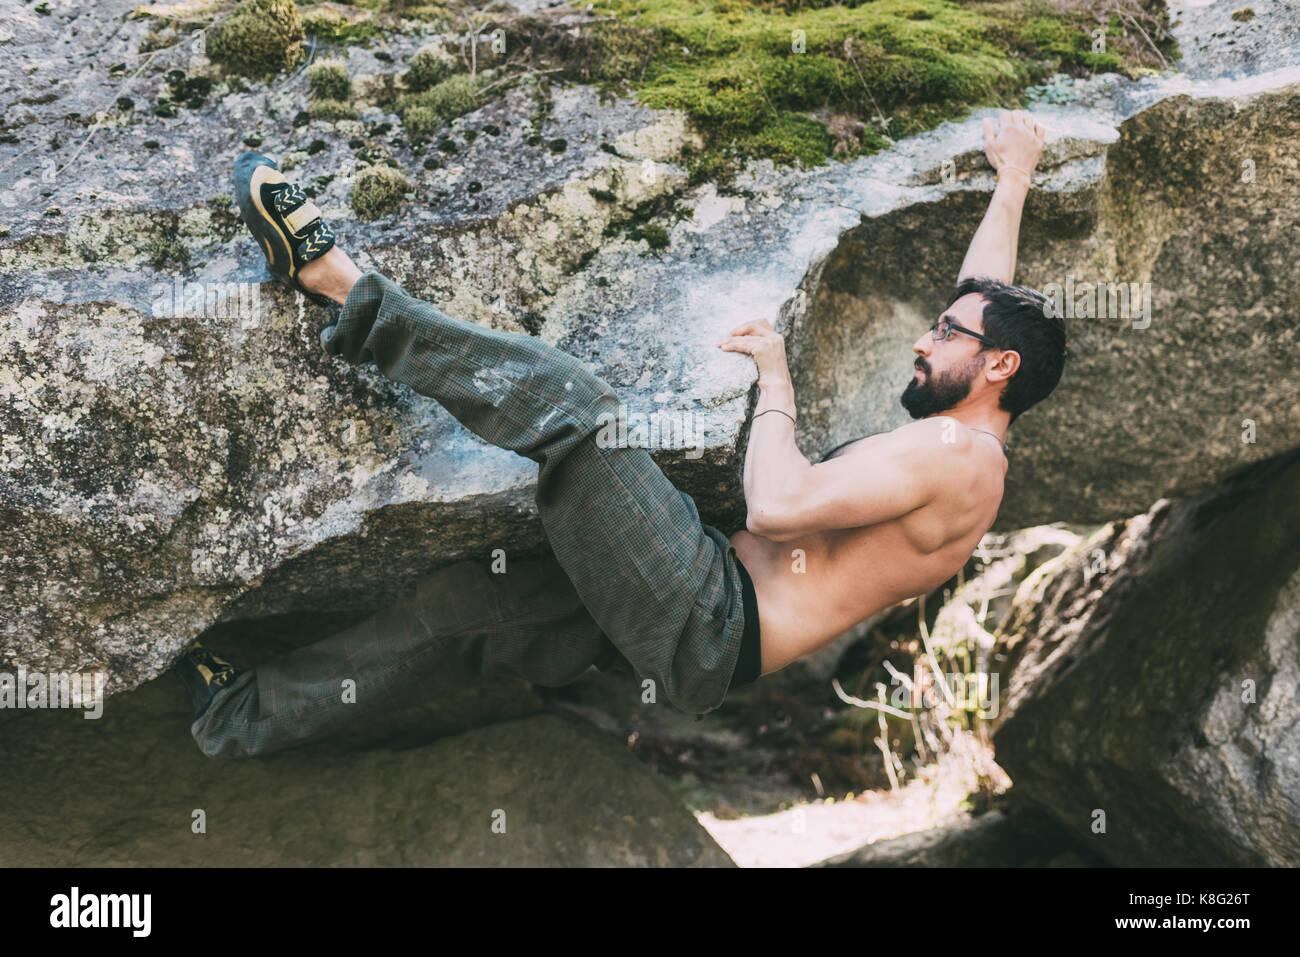 Torse nu homme boulderer-faux rocher d'escalade, Lombardie, Italie Photo Stock